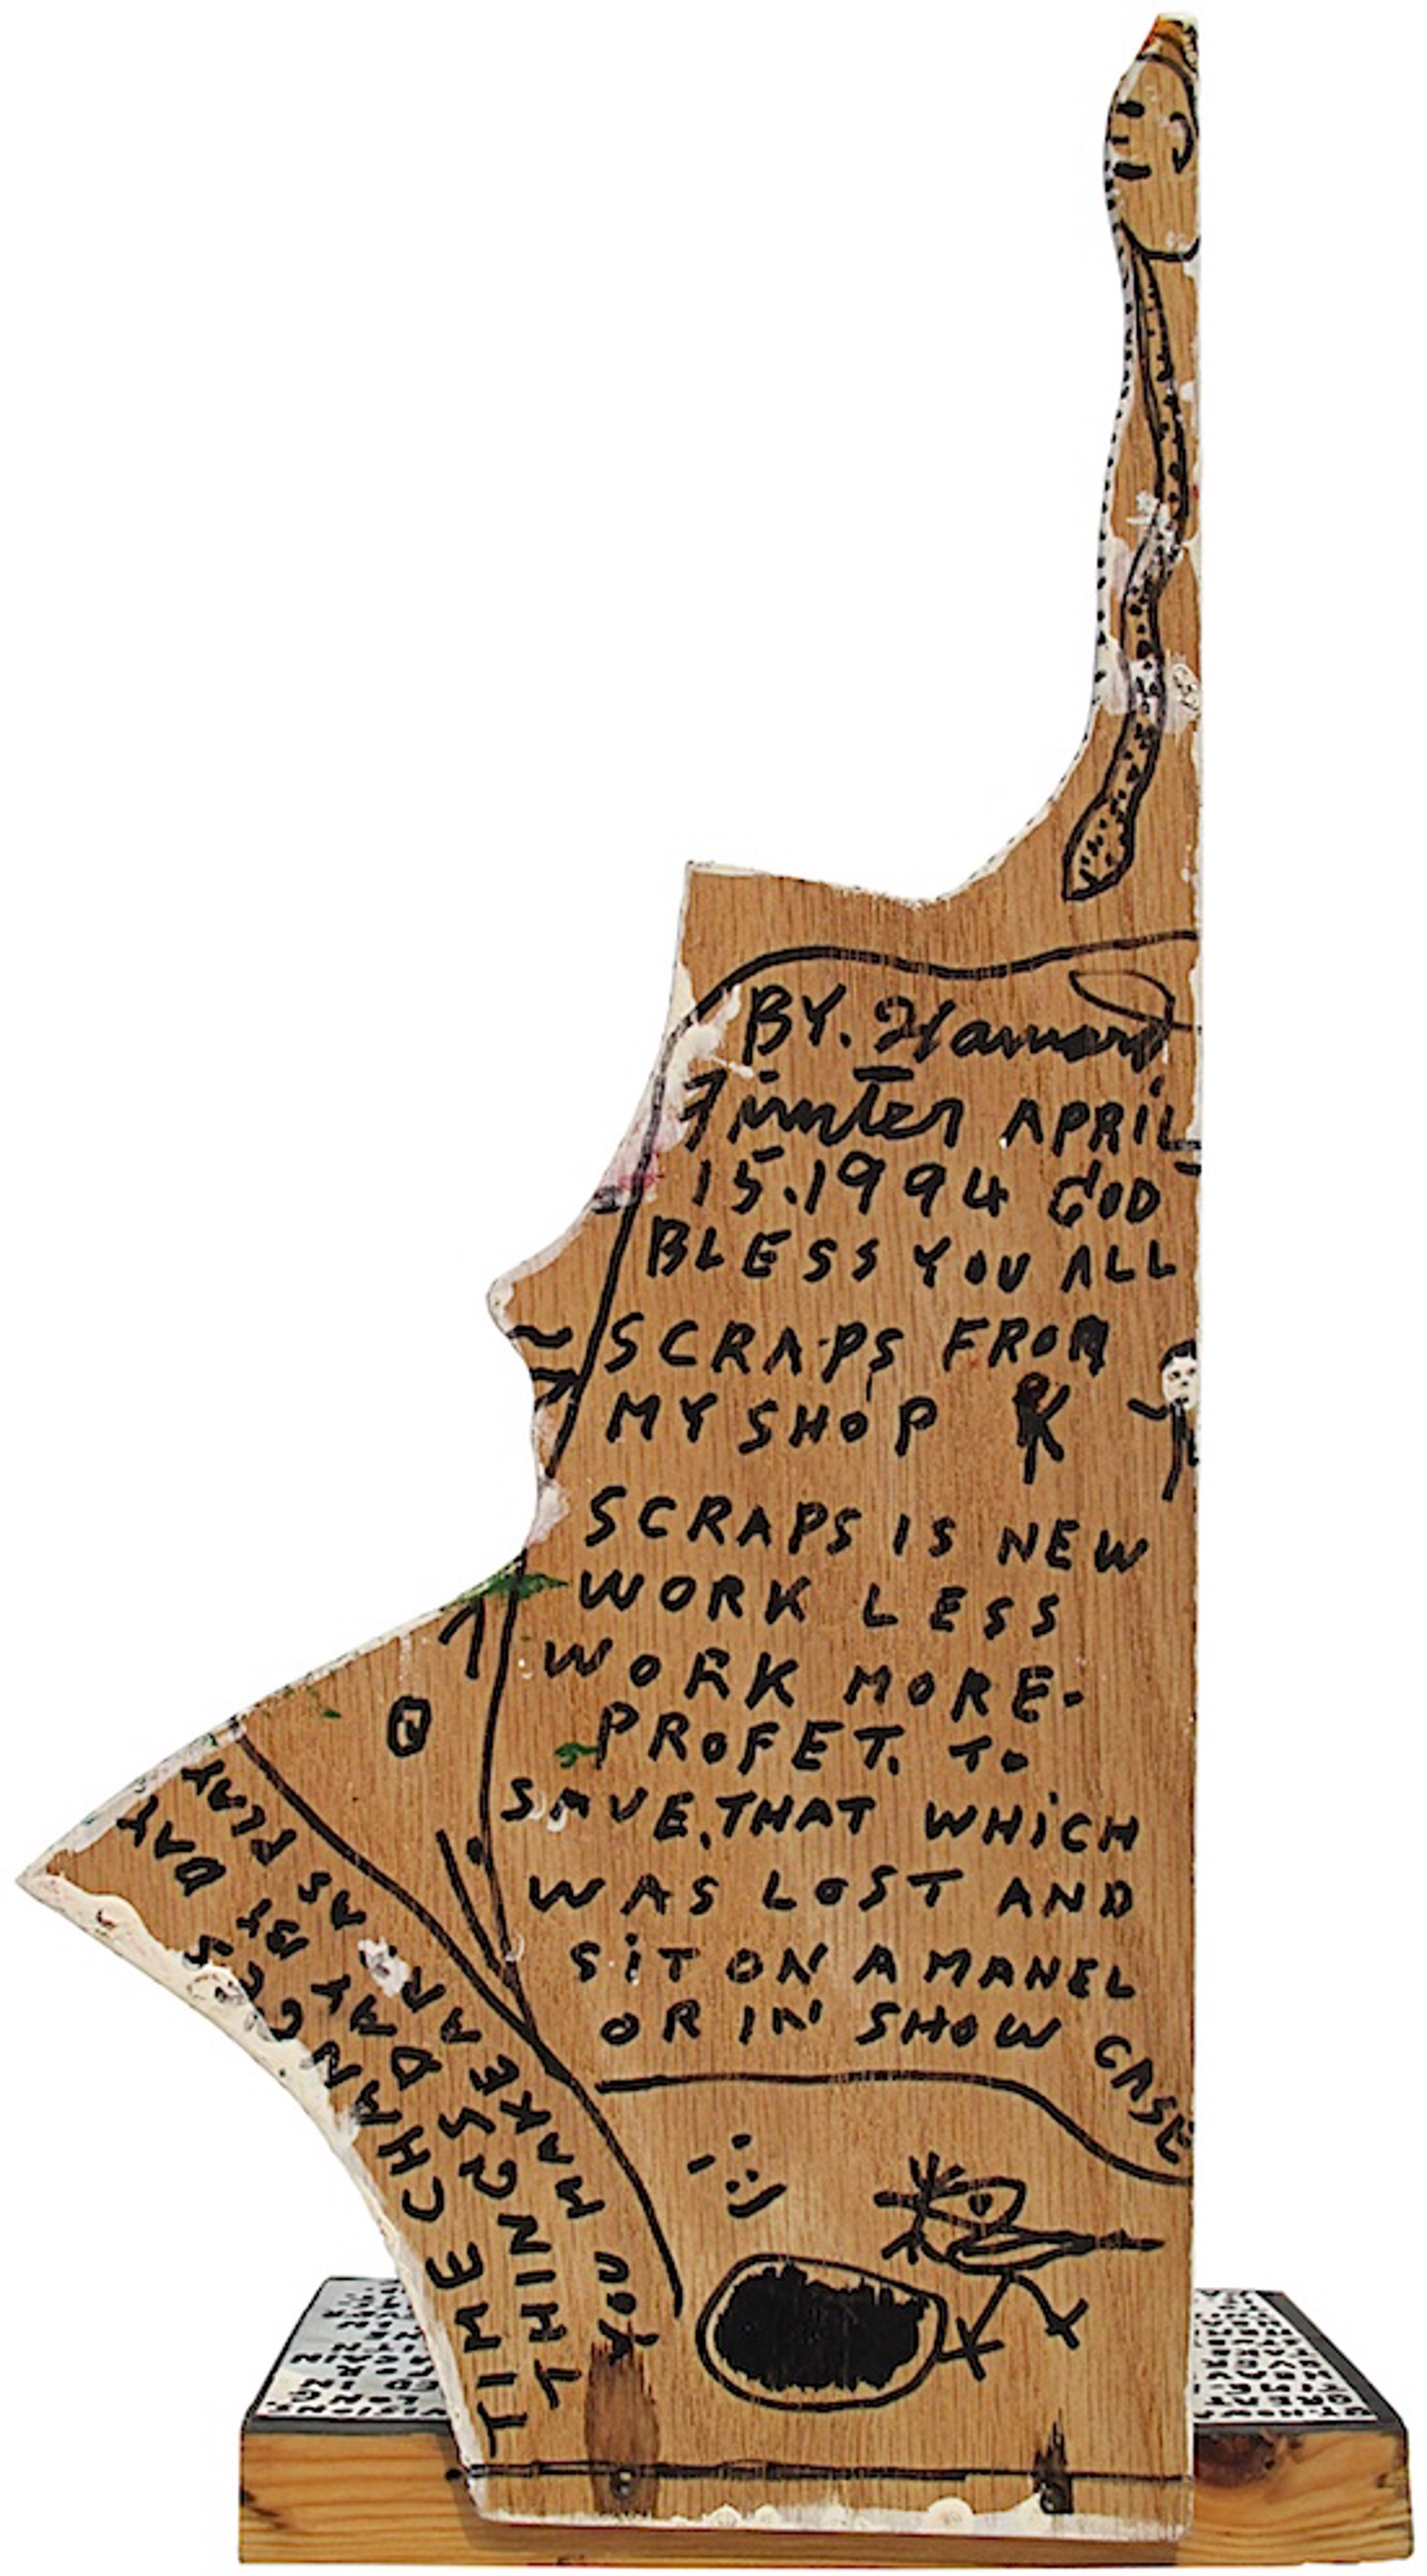 Scrap Wood by Howard Finster